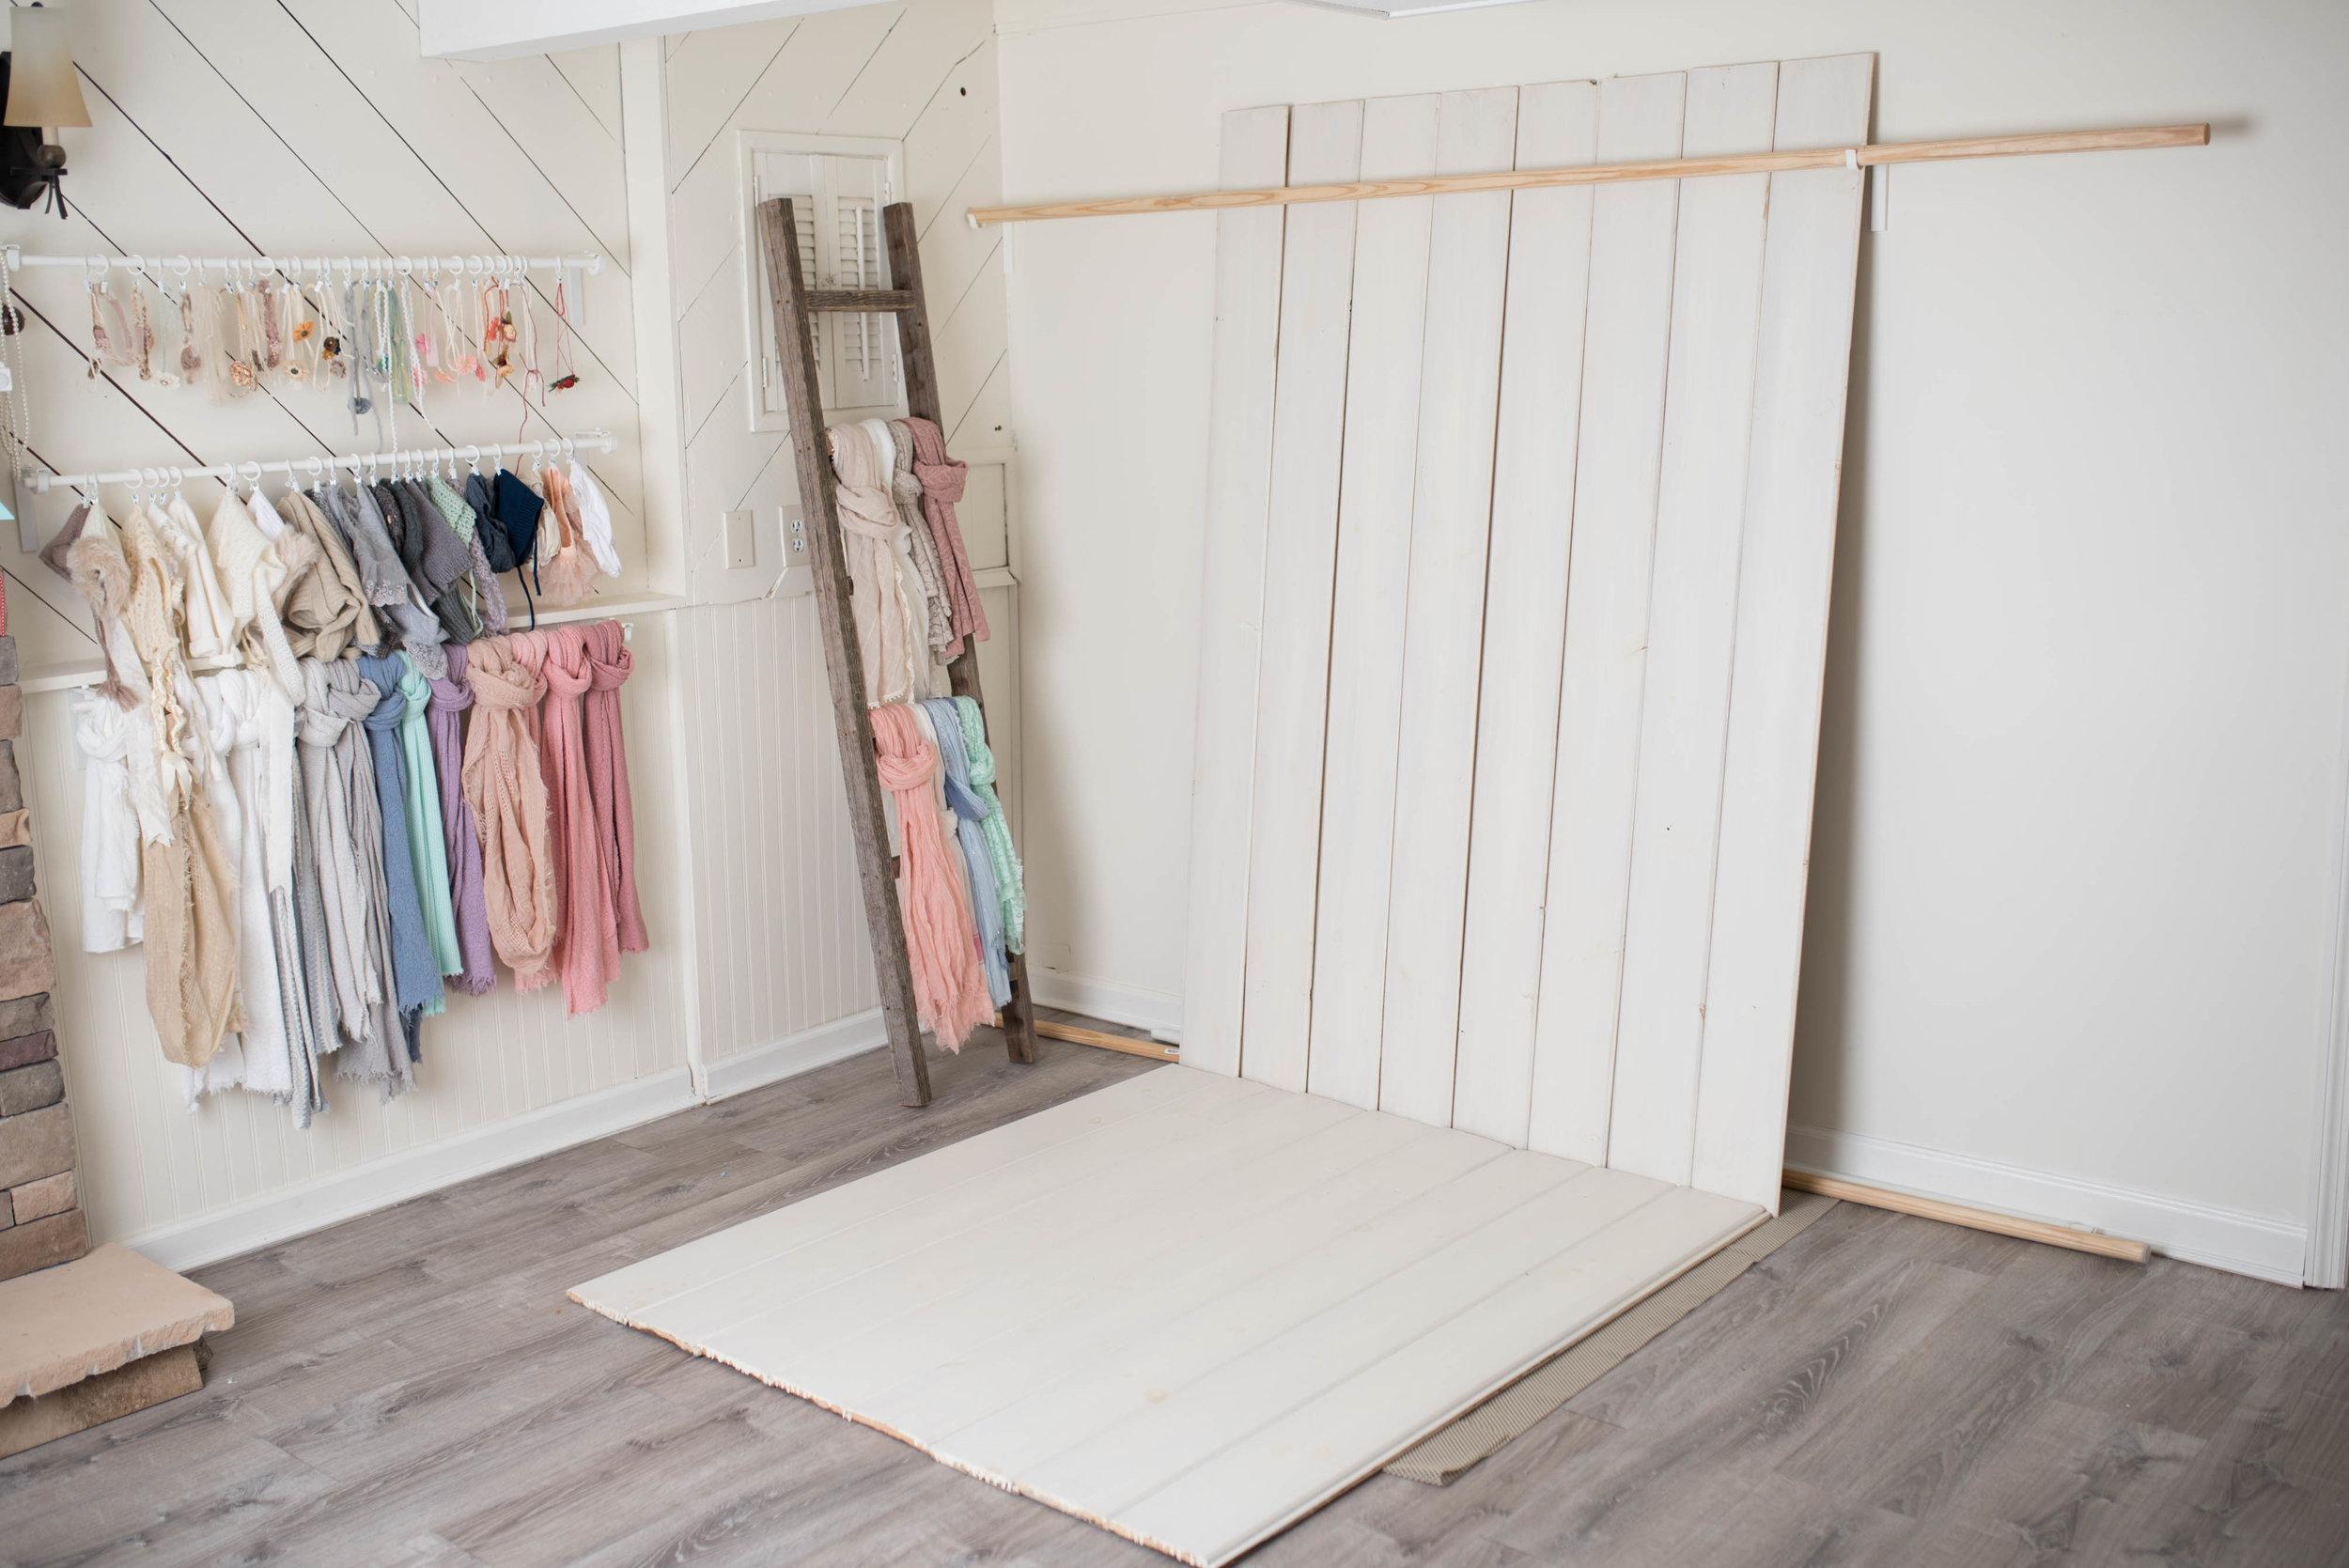 saratoga springs new york boutique photography studio-2.jpg